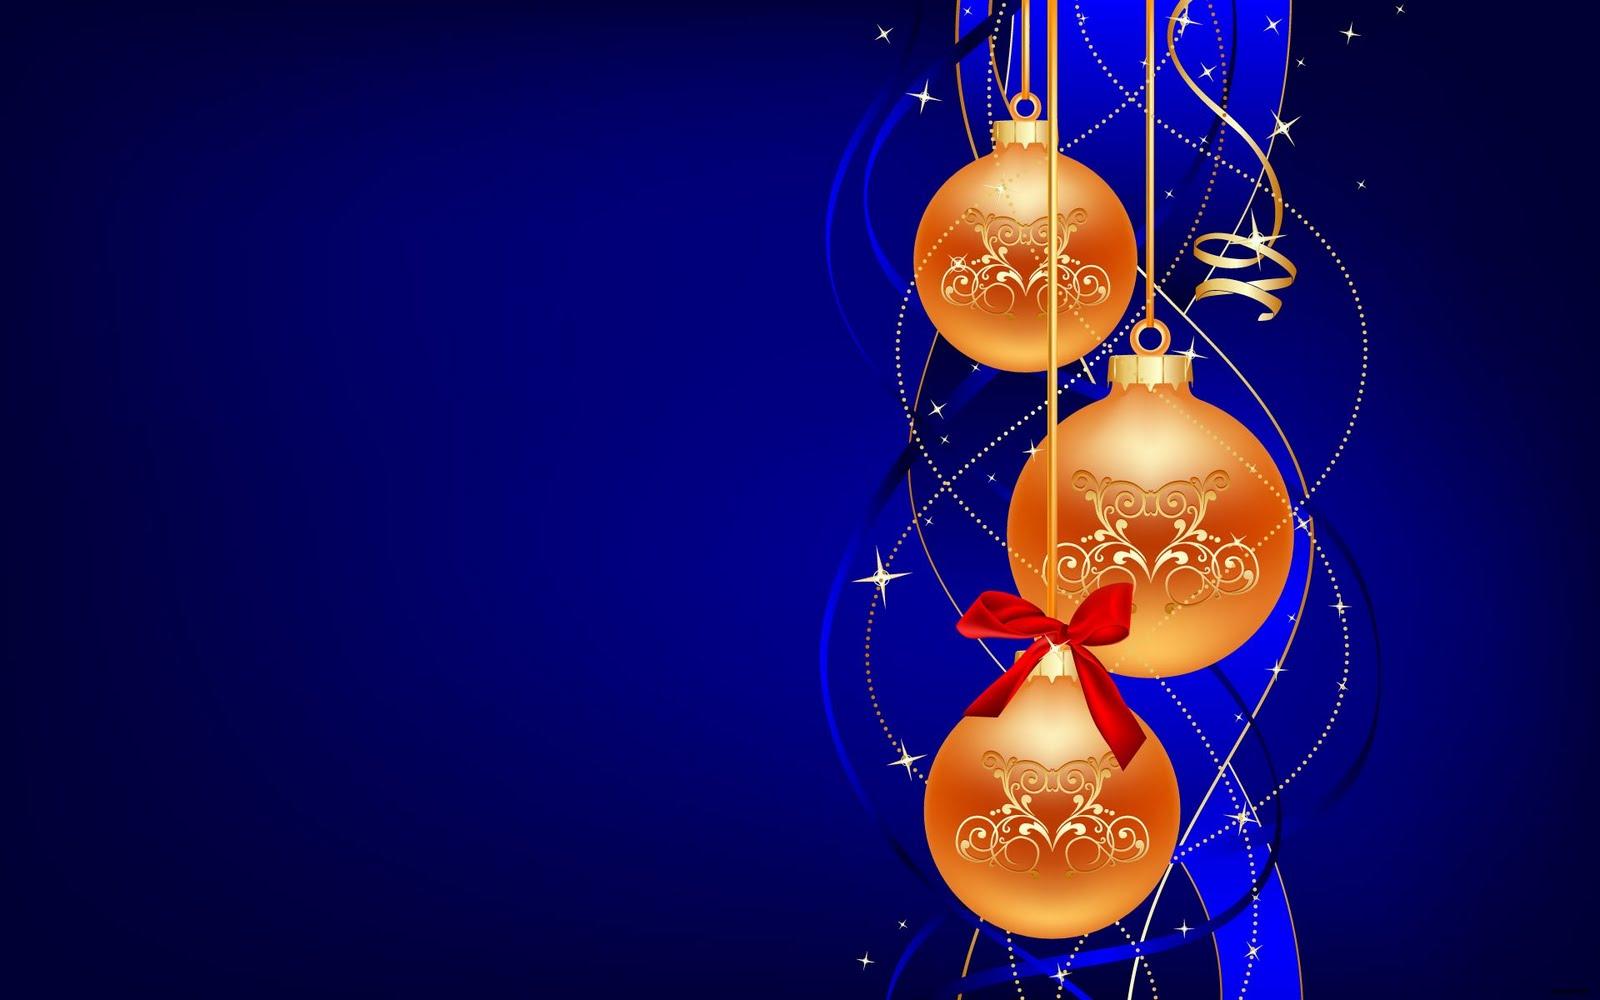 Immagini Natale Desktop.Sfondi Desktop Natale Per Pc Cartolina Natalizia